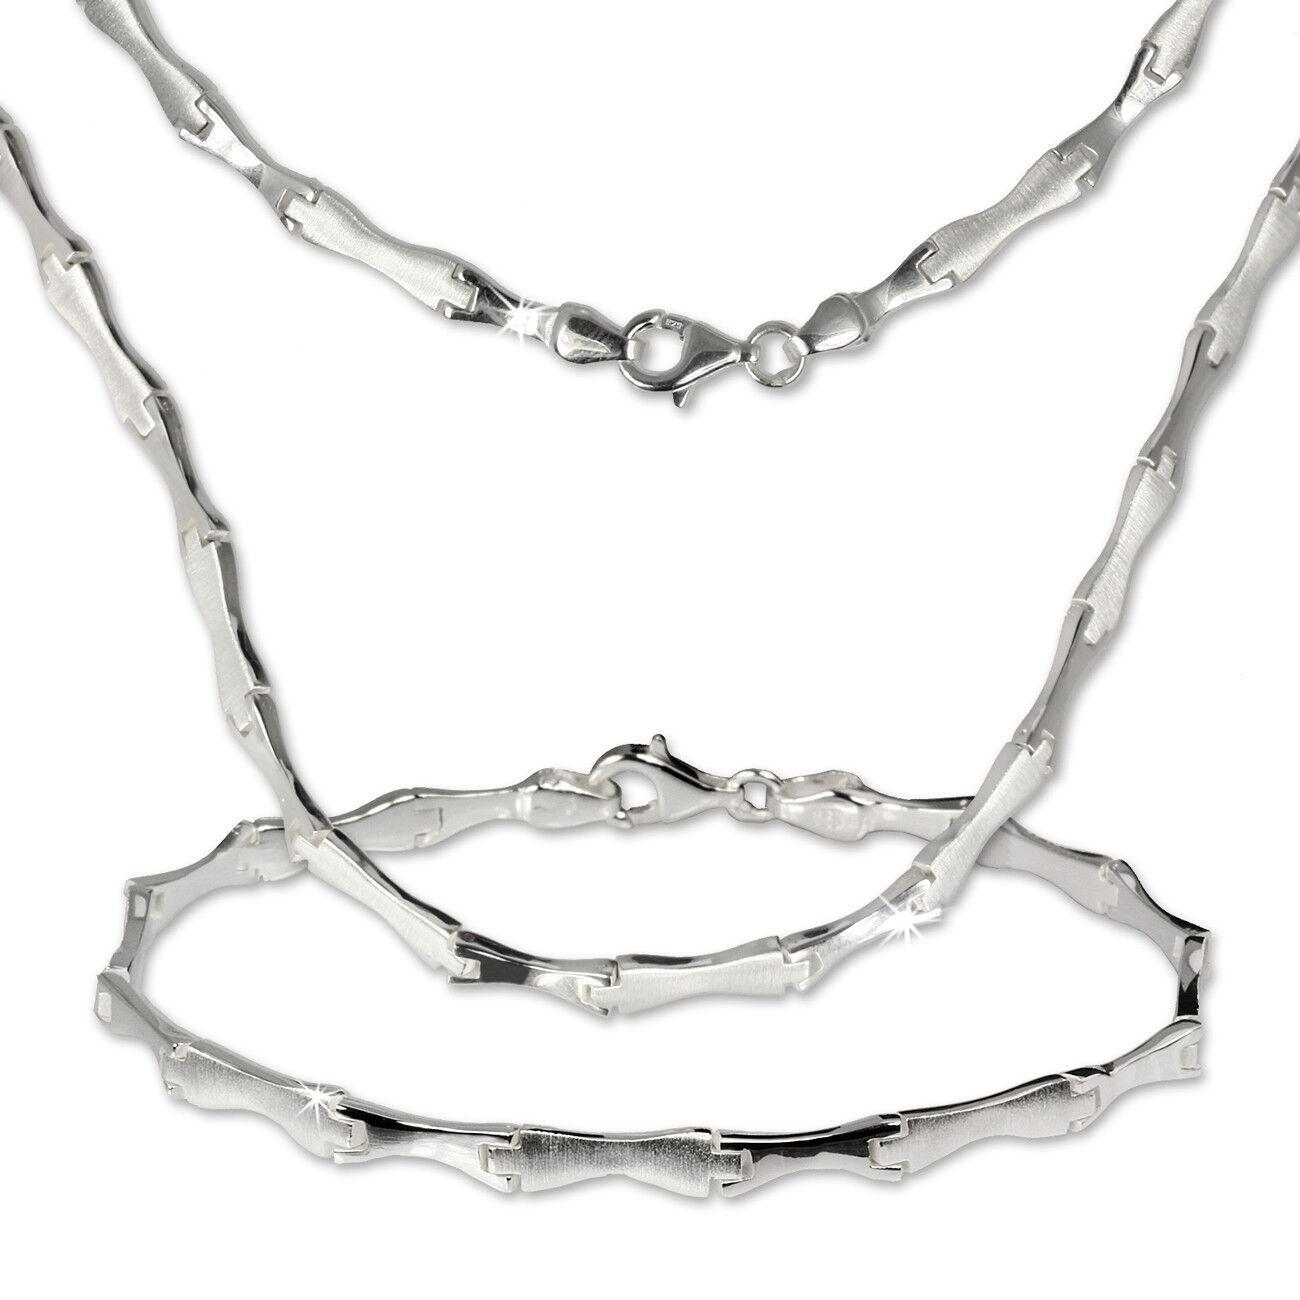 argentoDream Gioielli Set Collier & Bracciale Bracciale Bracciale Style 925 argentoO sds405 c40626